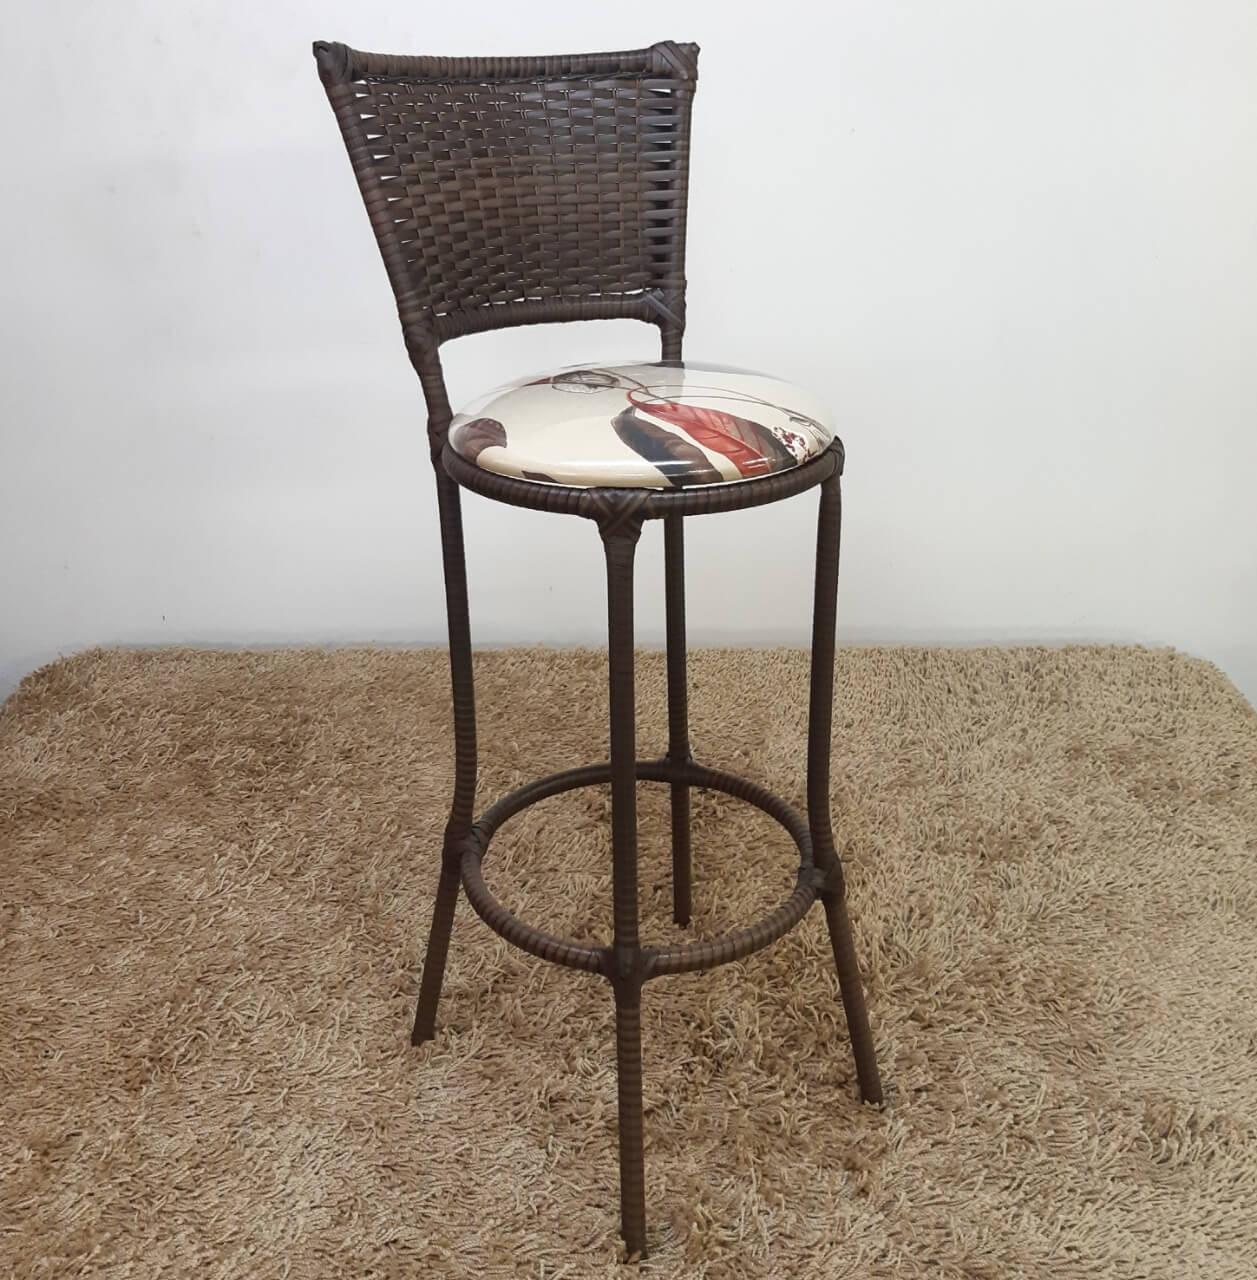 Banqueta Fibra Sintética Artdesign06